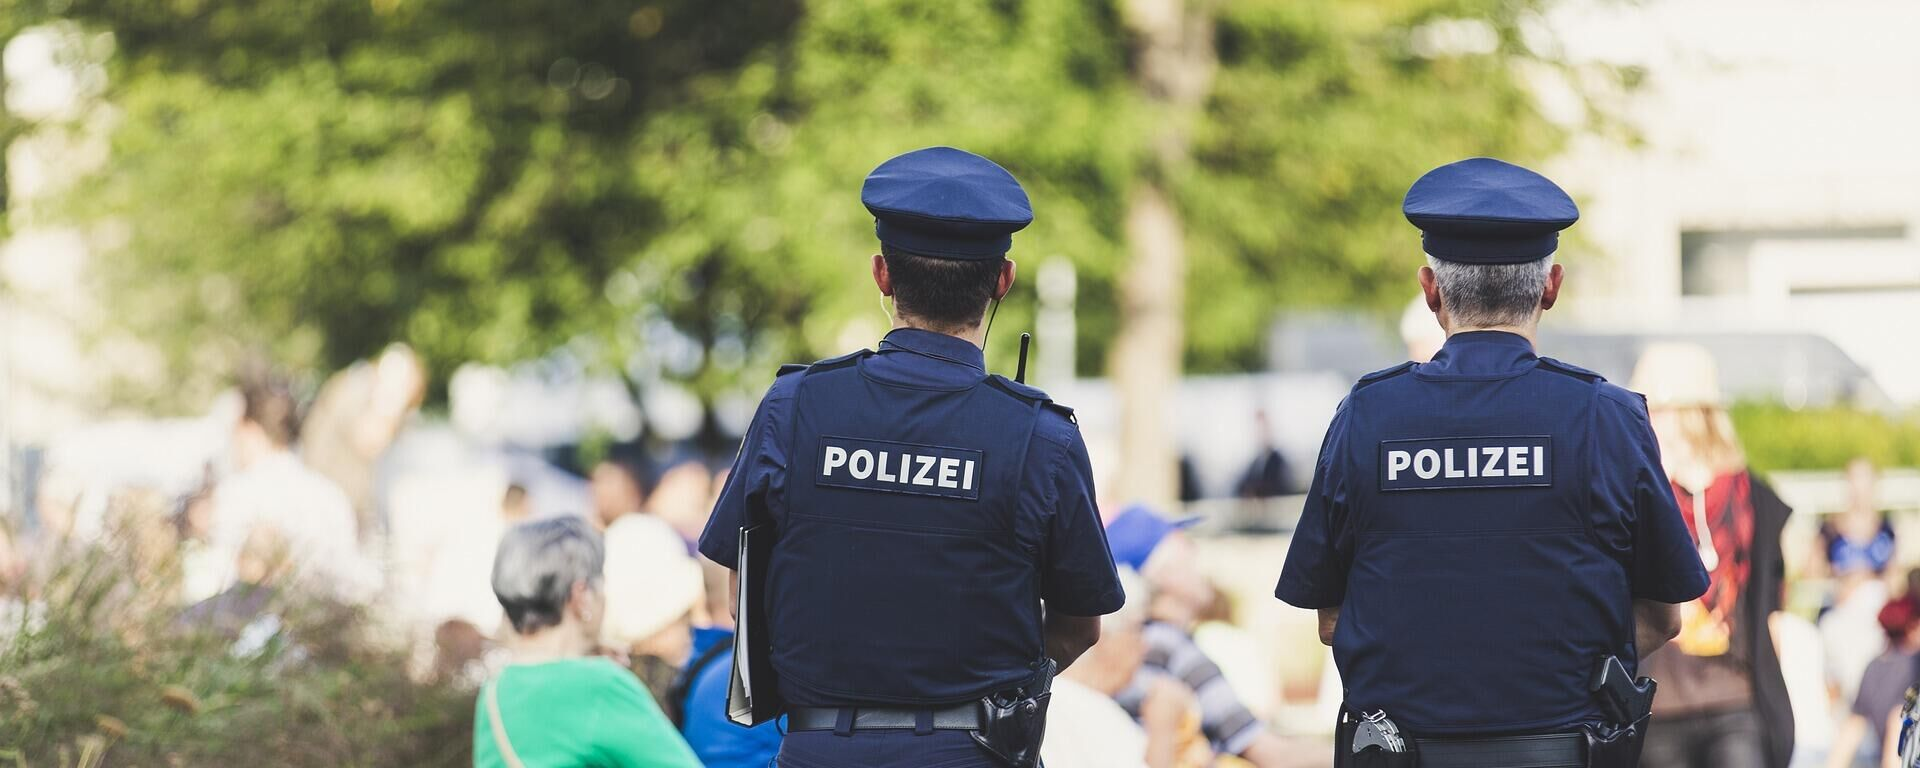 Polizeieinsatz (Symbolbild) - SNA, 1920, 02.07.2021